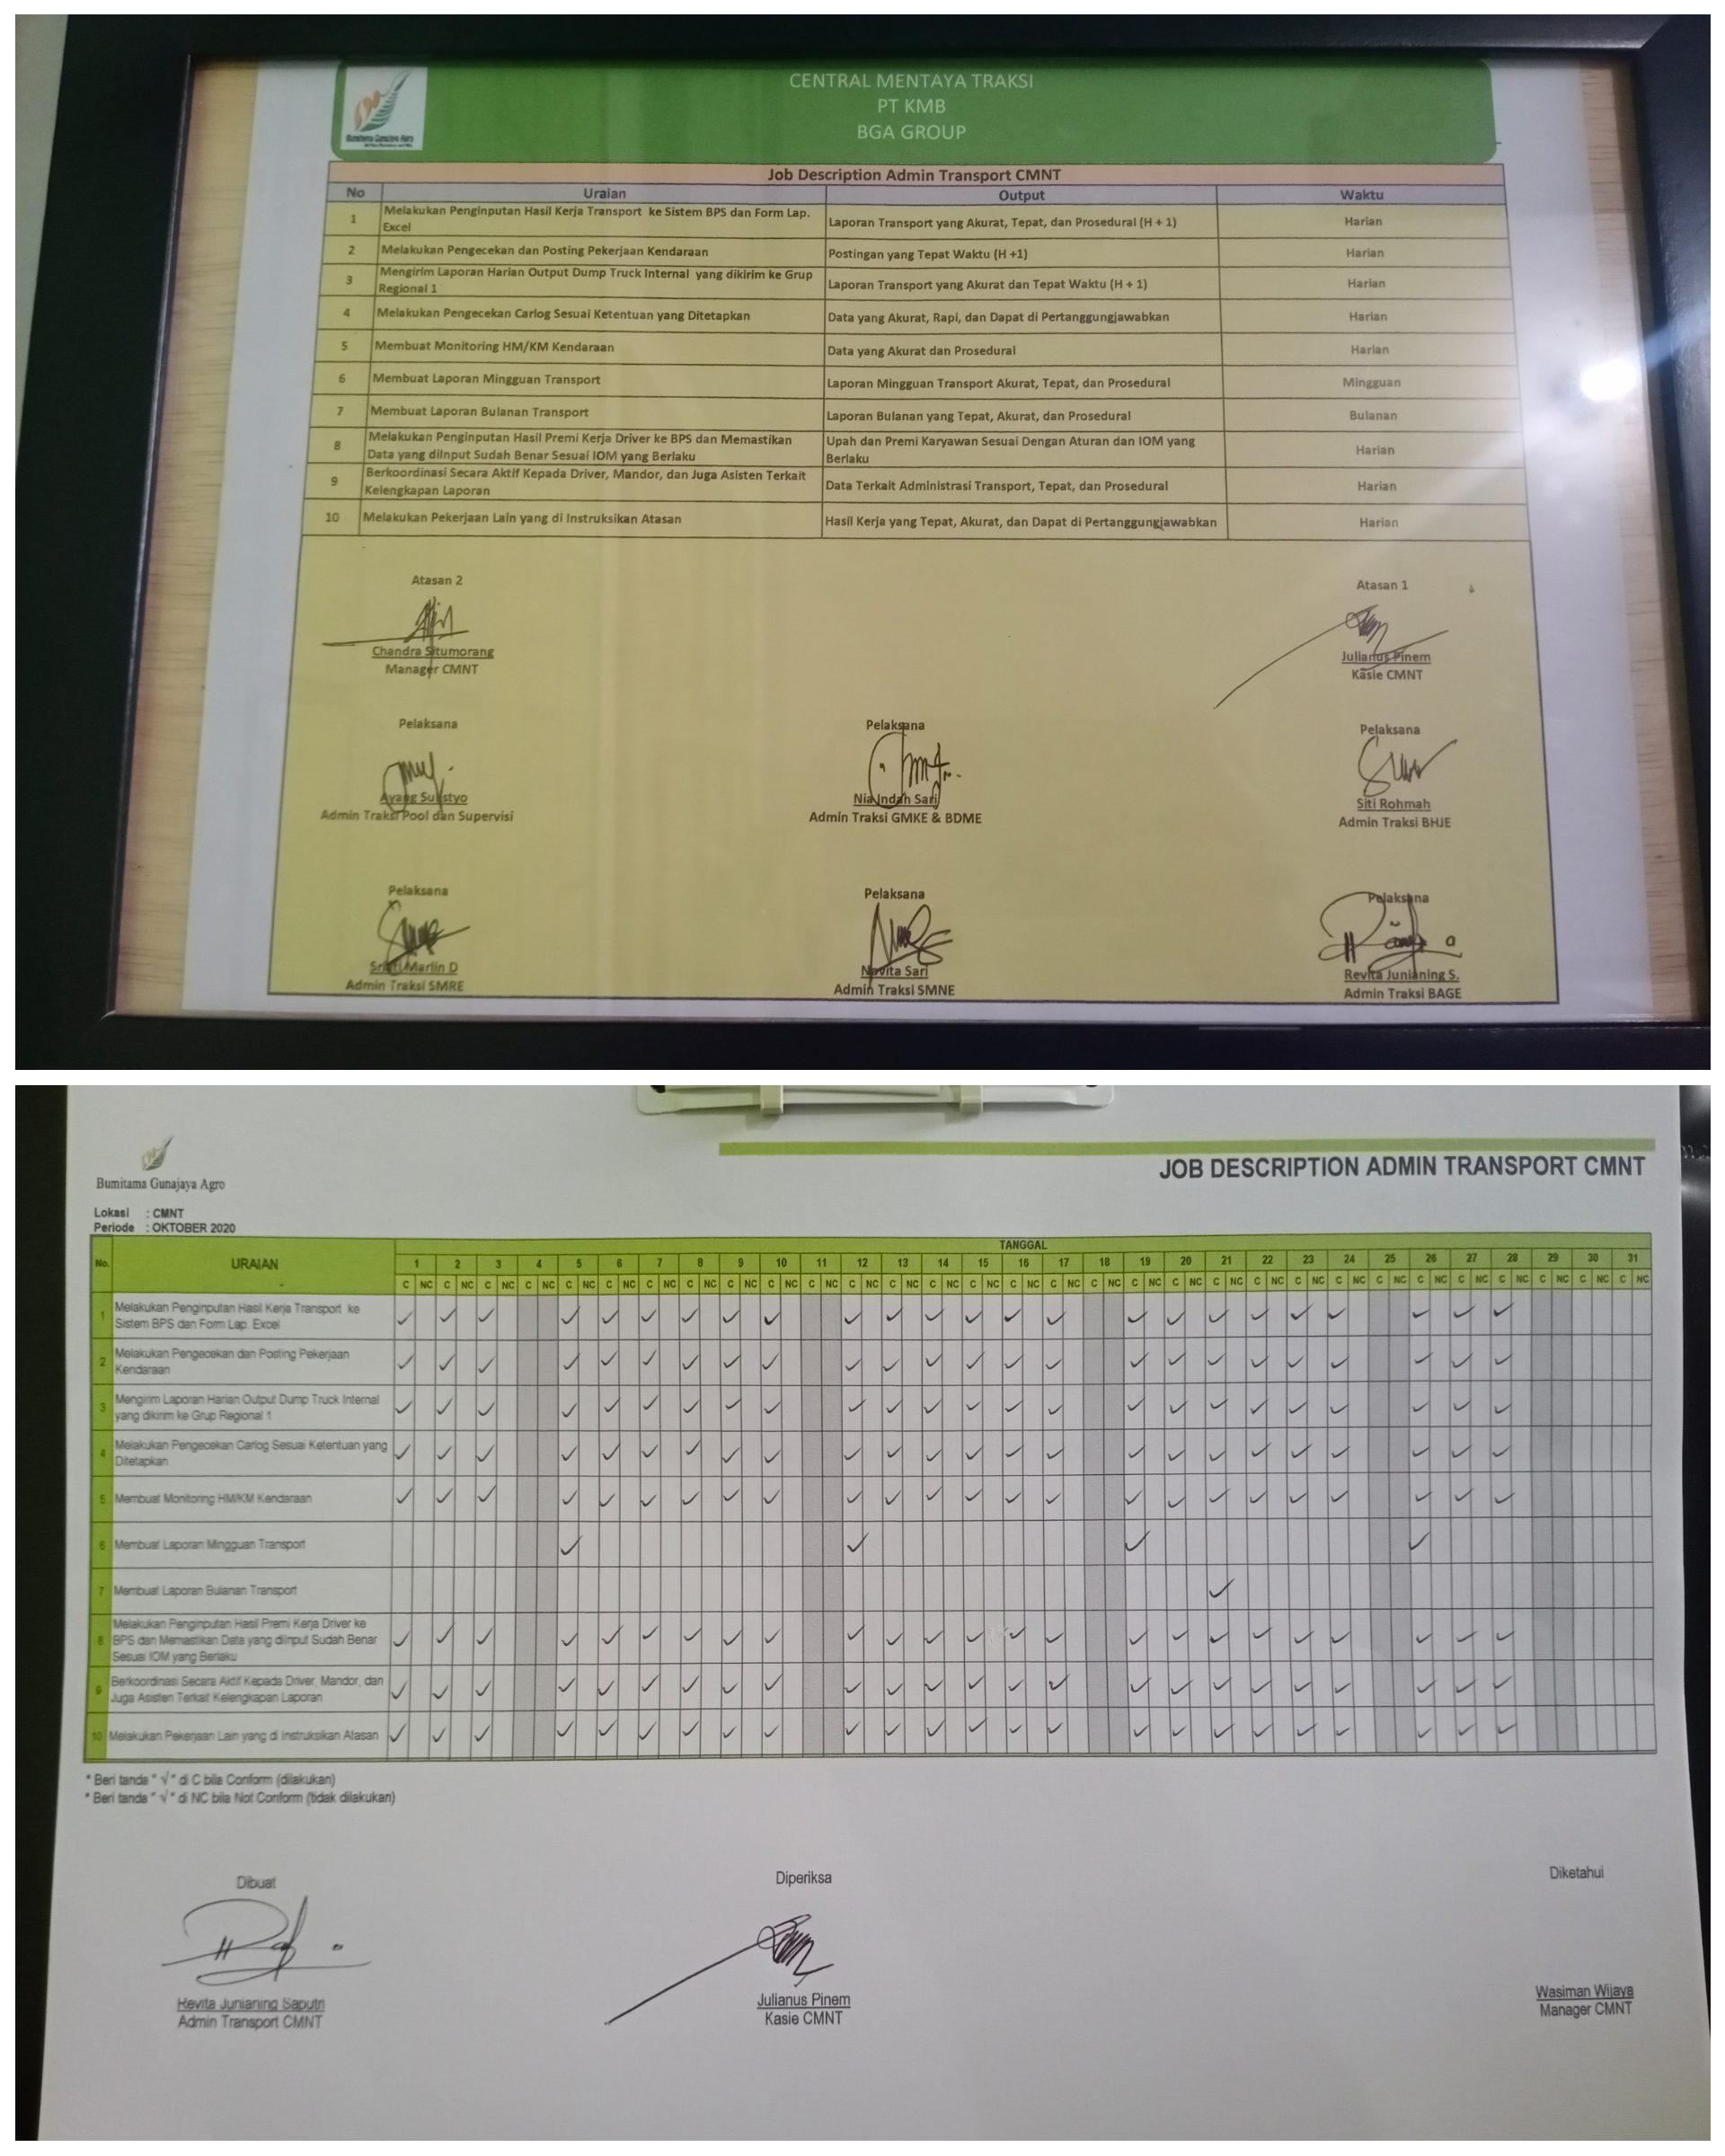 Job Description Admin CMNT vs Monitoring Penerapan Hariannya !